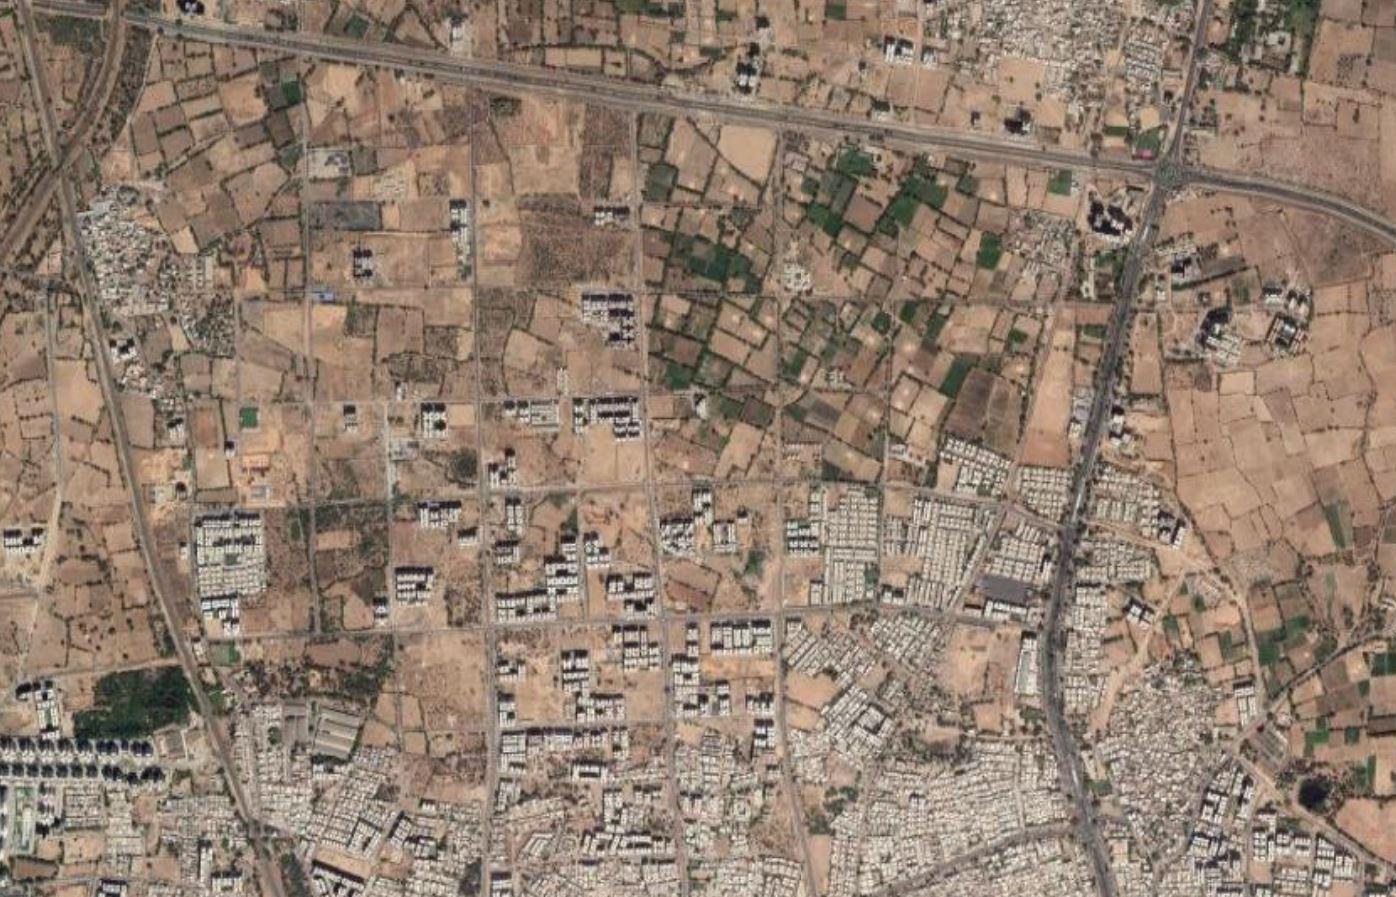 Hindusi mogą nas uczyć jak planować miasta